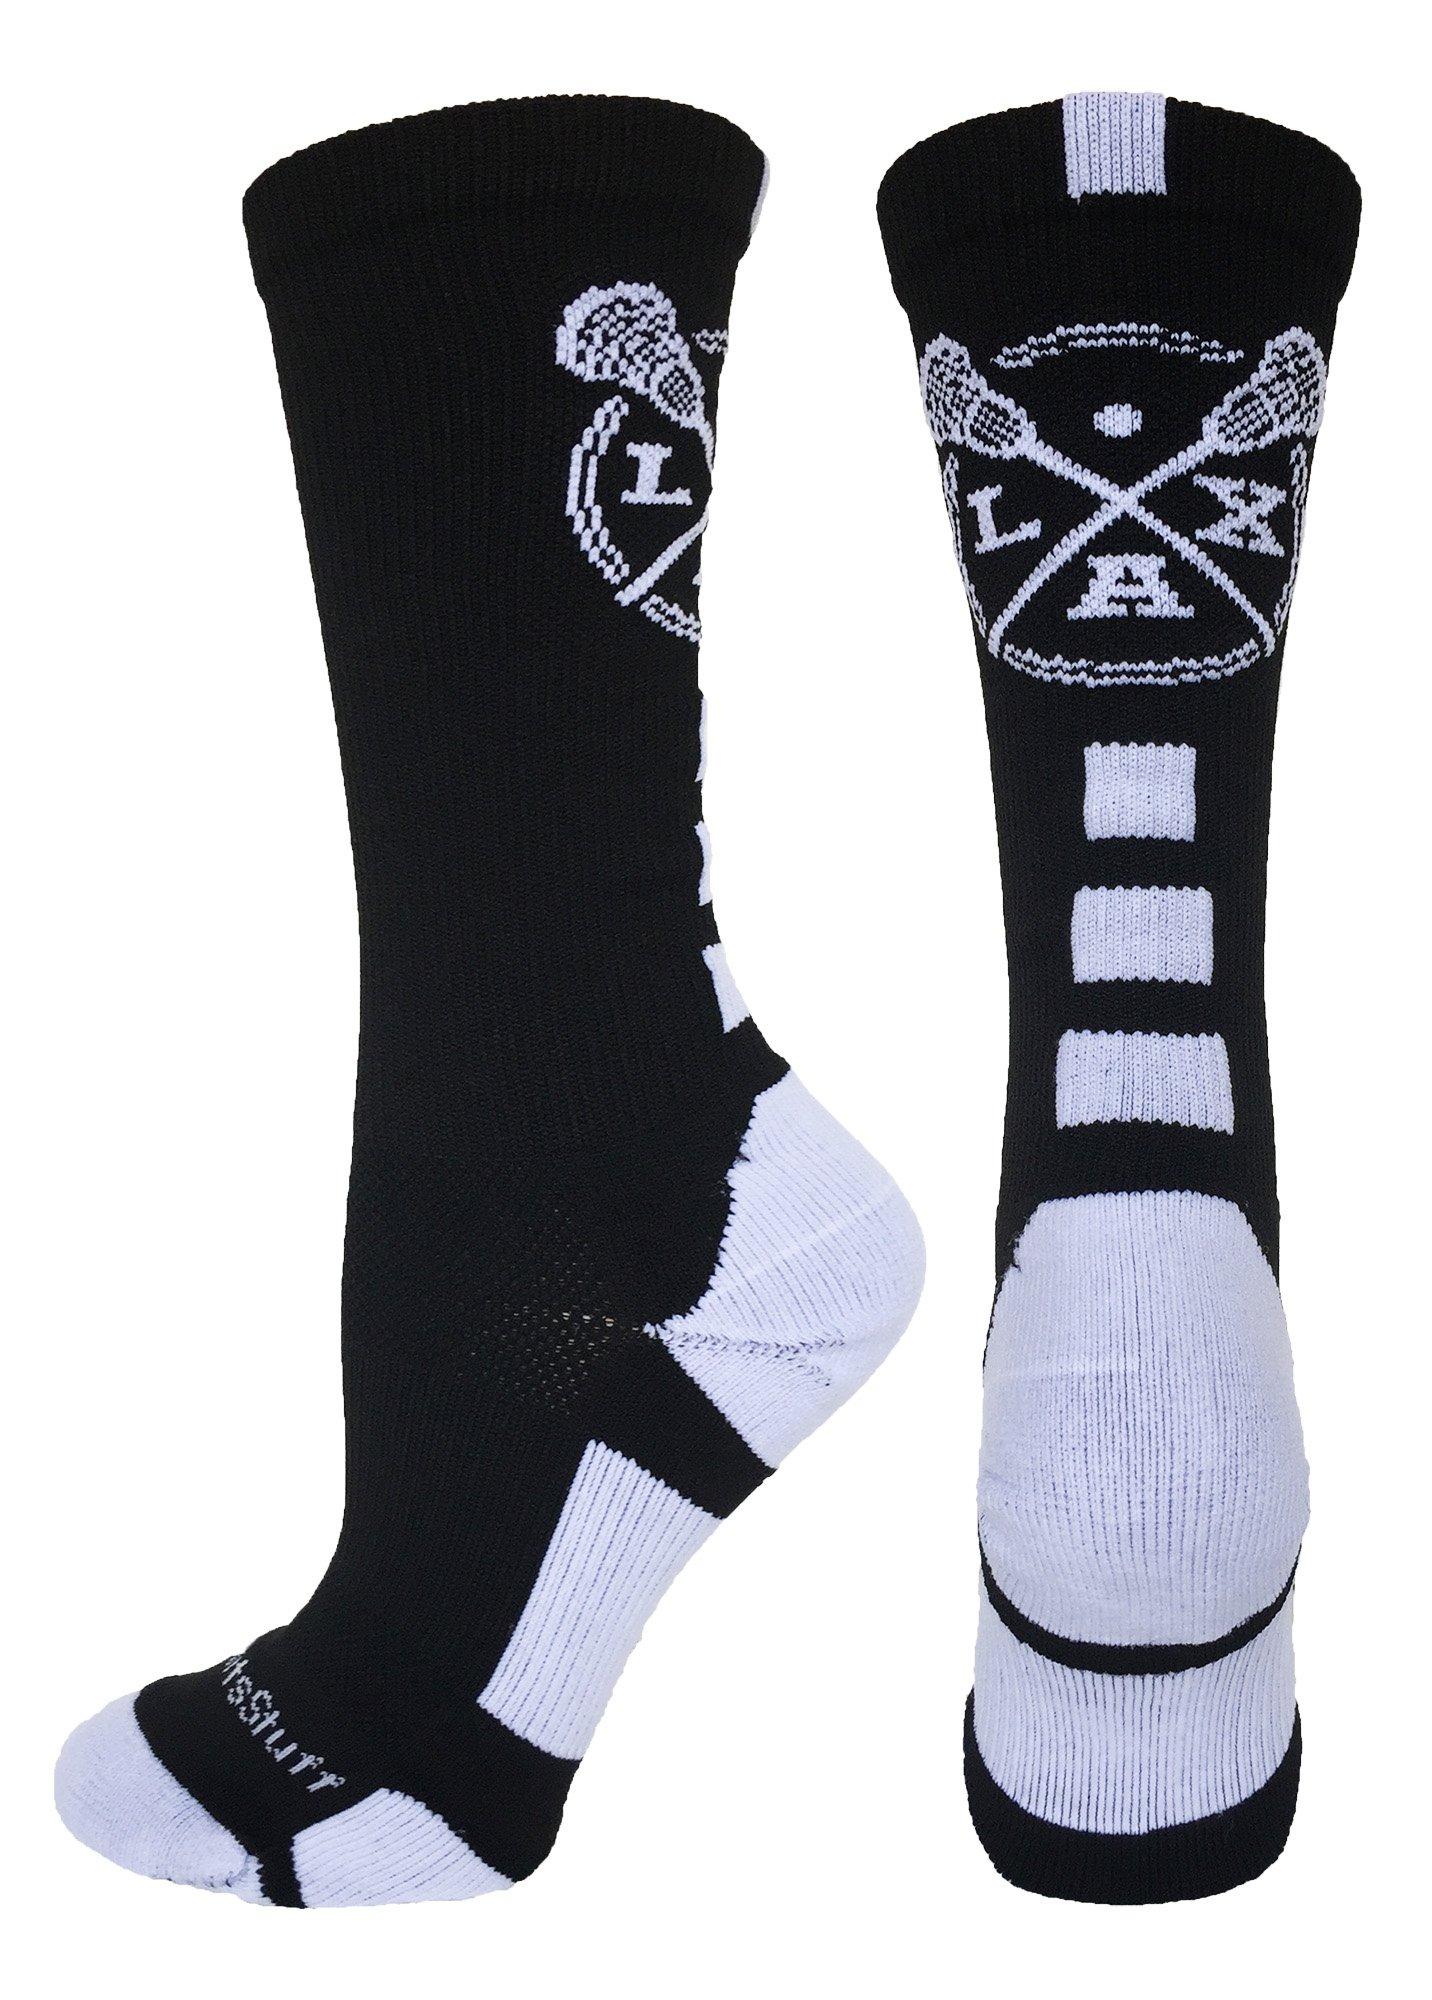 MadSportsStuff LAX Lacrosse Socks Lacrosse Sticks Athletic Crew Socks (Black/White, Large)